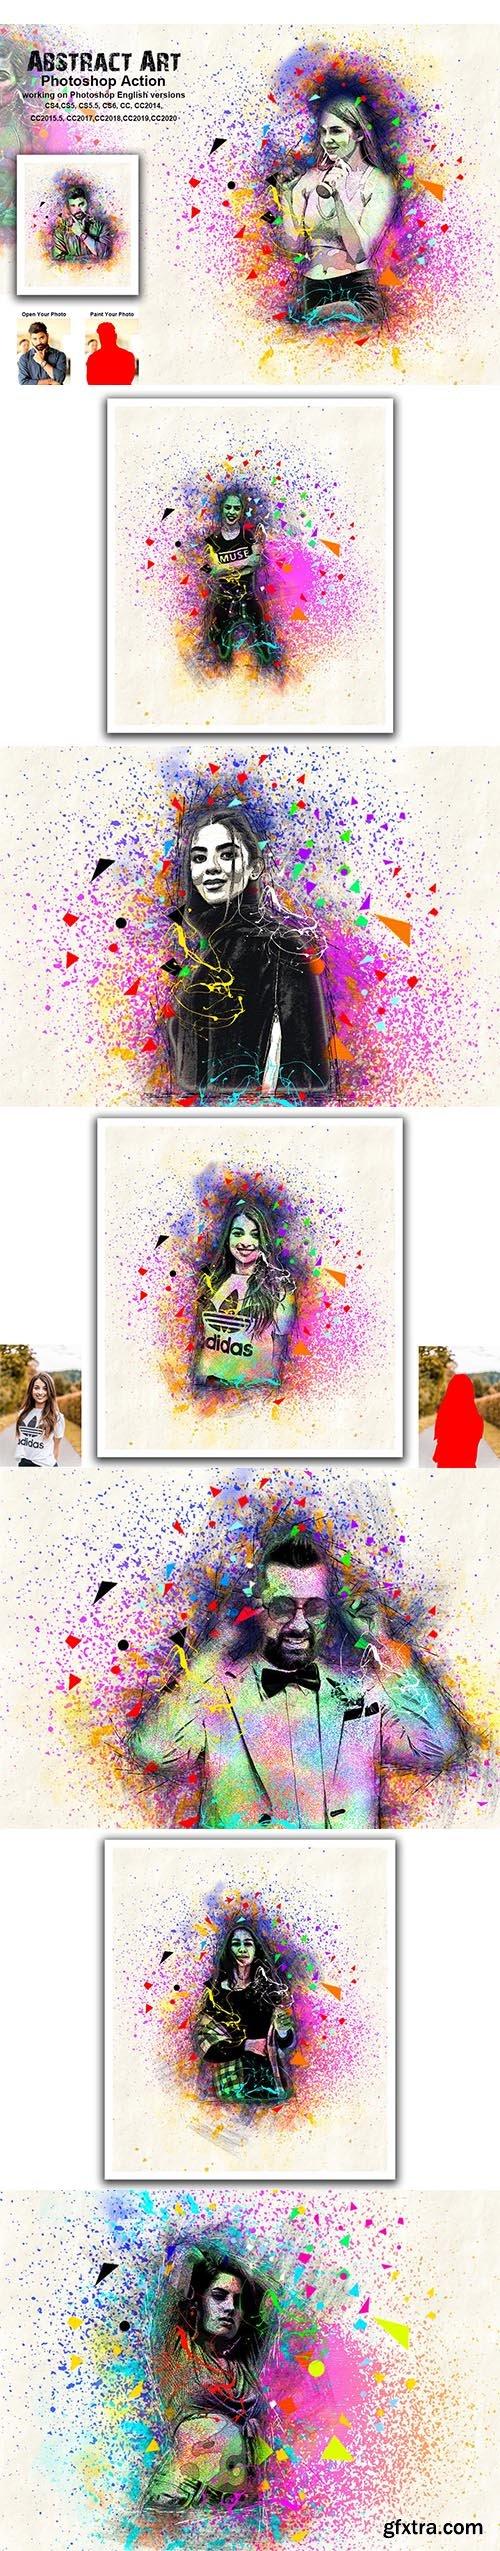 CreativeMarket - Abstract Art Photoshop Action 5480258